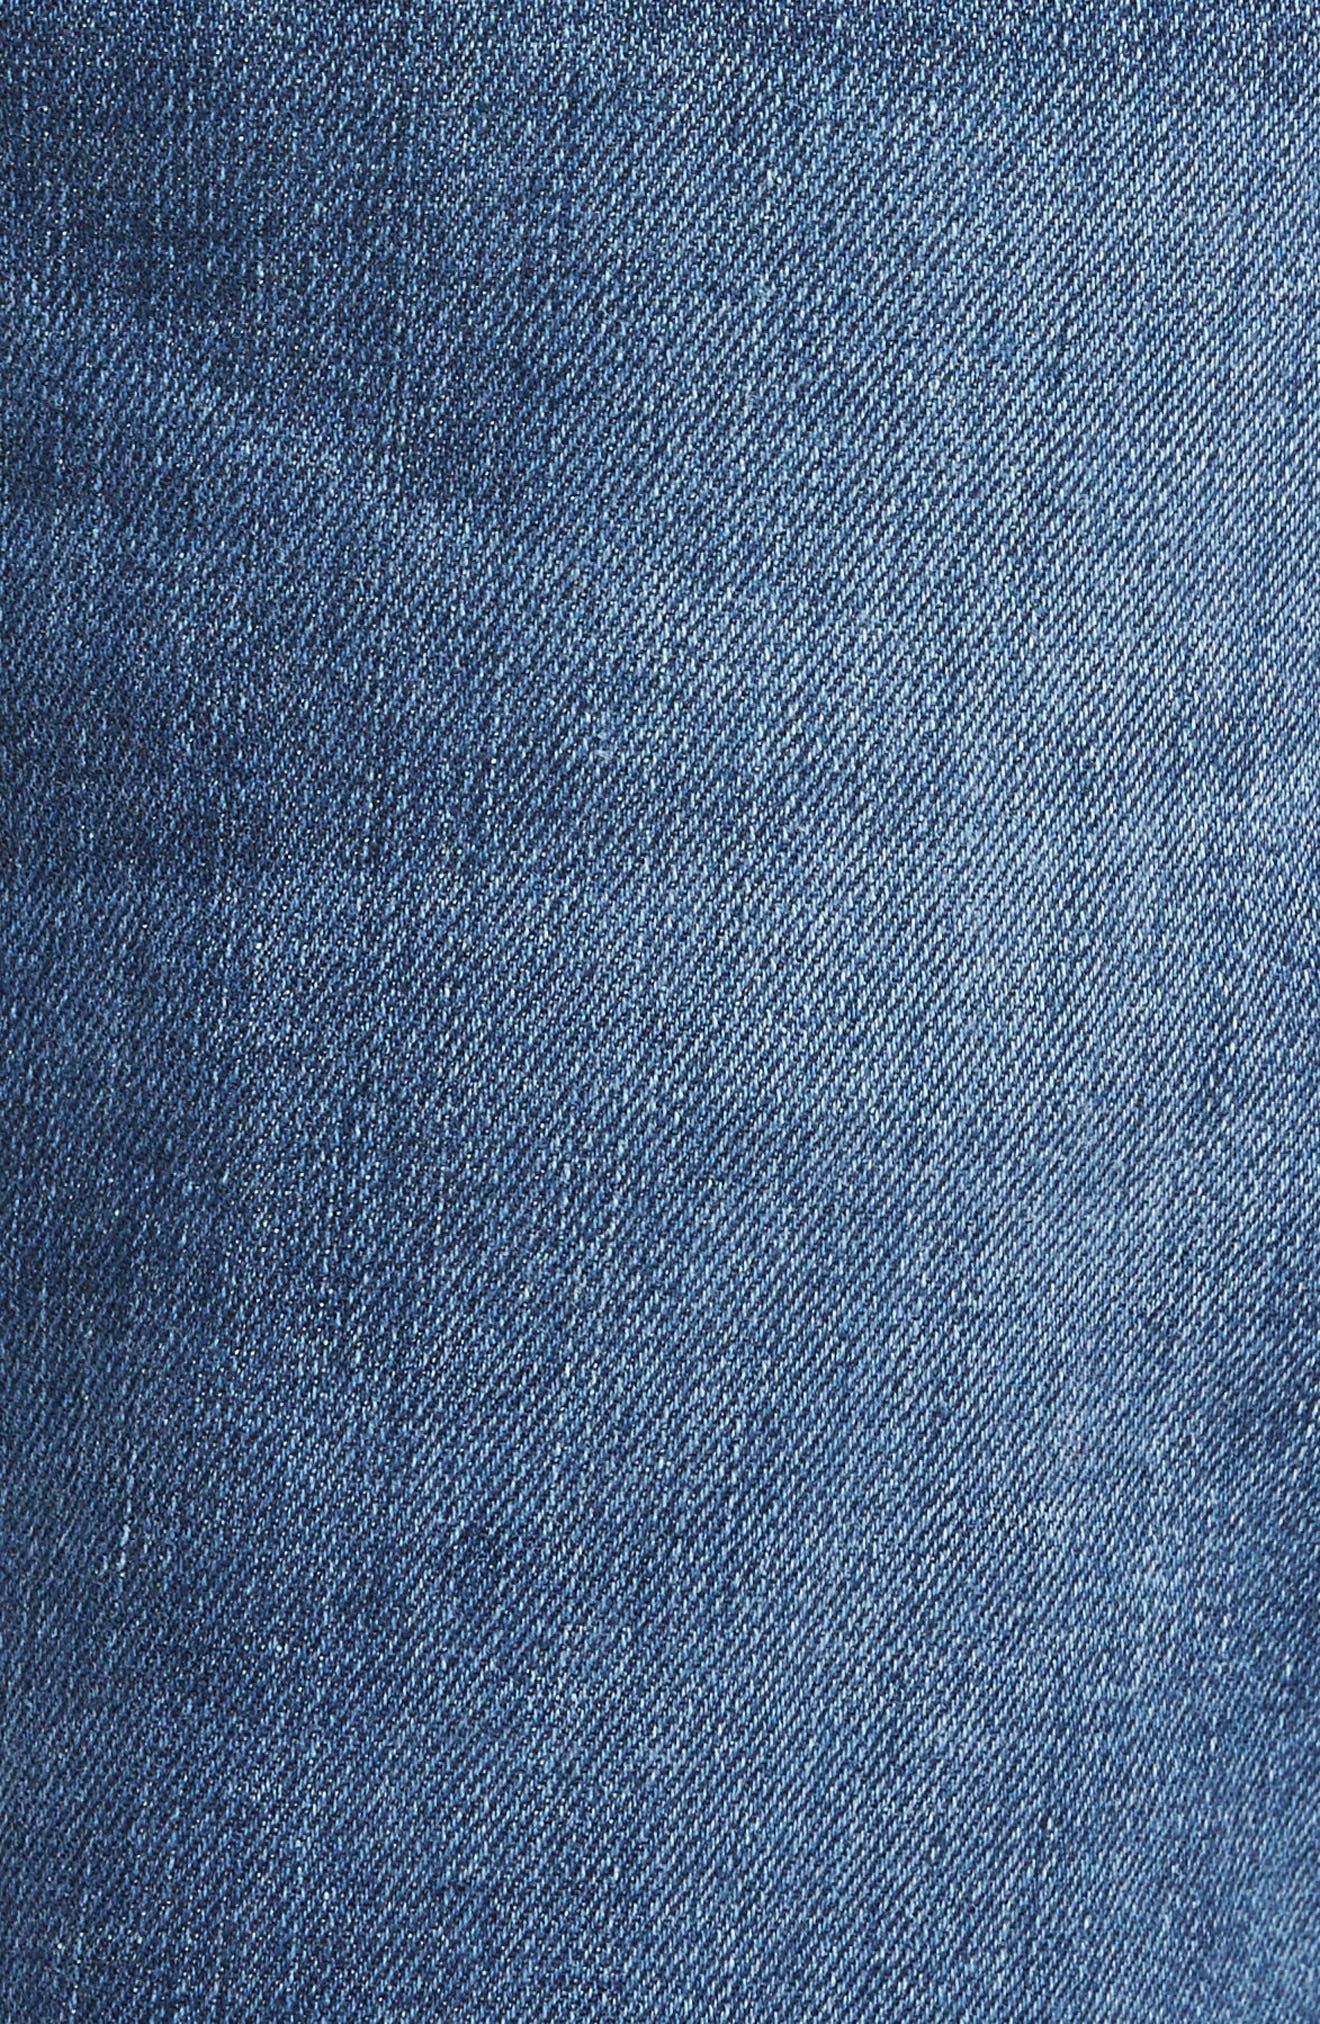 Byron Slim Straight Leg Jeans,                             Alternate thumbnail 5, color,                             421